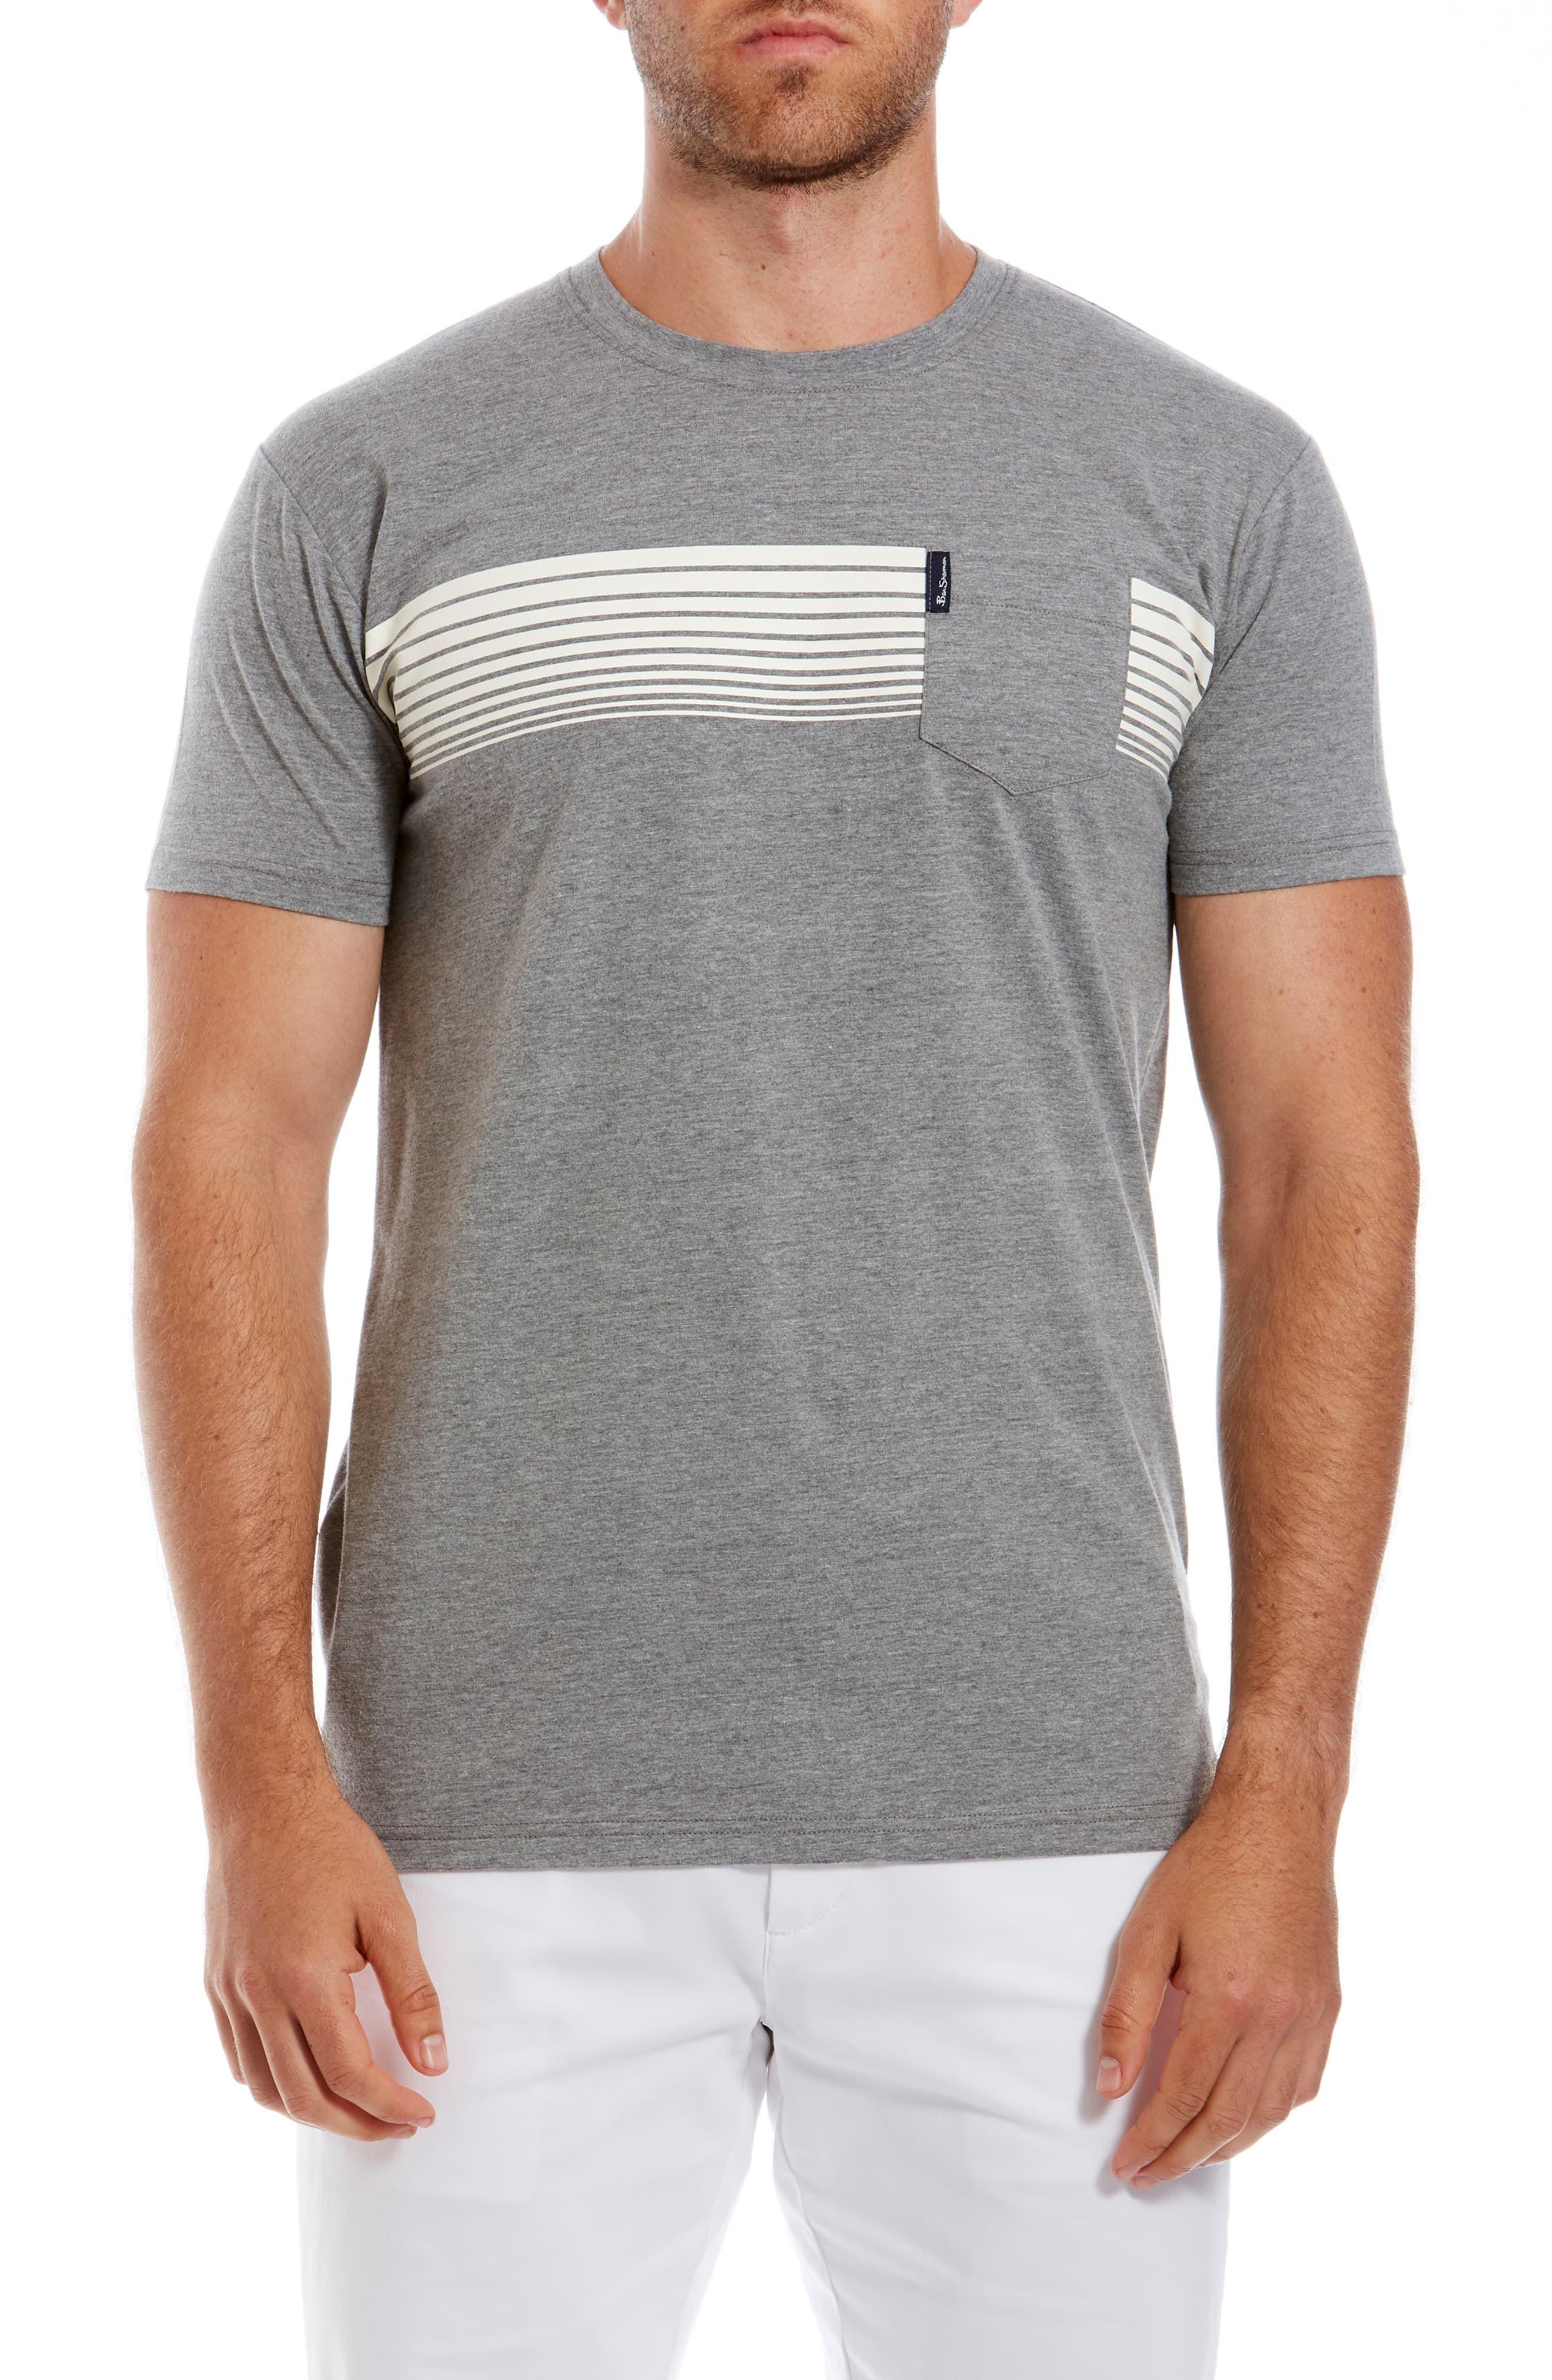 Ben Sherman Chest Stripe T Shirt In 2019 Products Ben Sherman Mens Clothing Styles Shirts